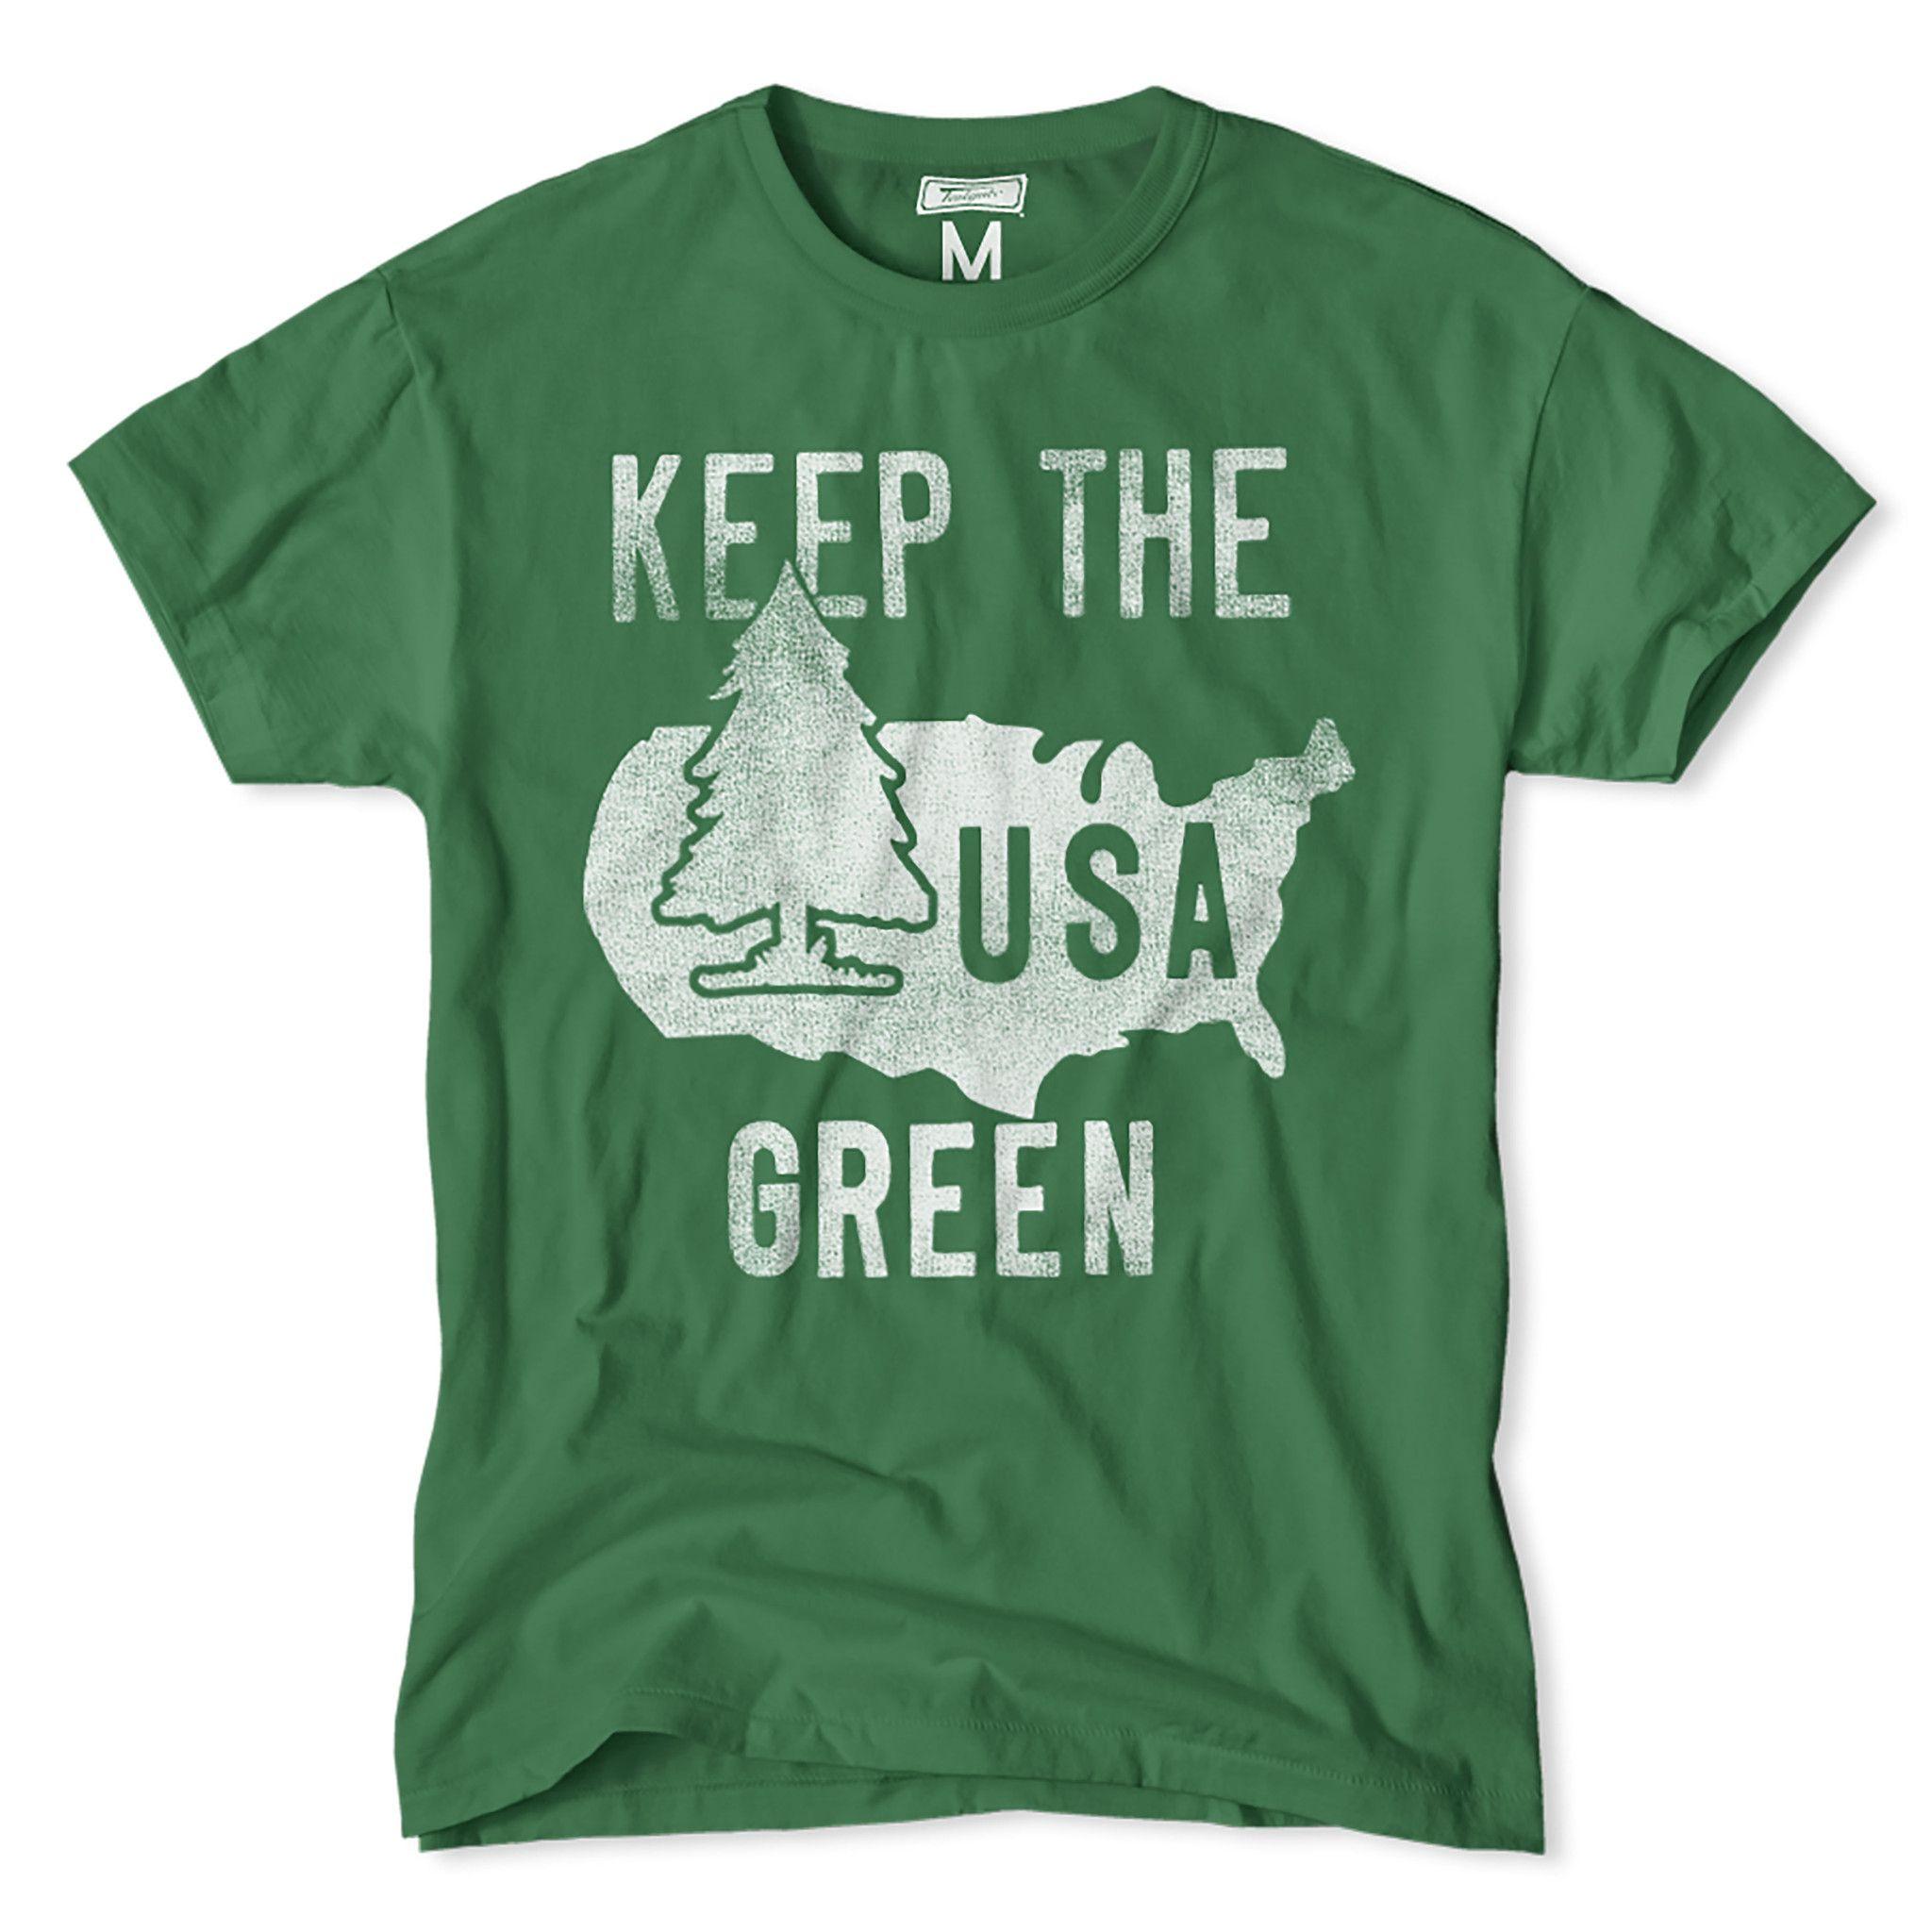 Shirt design usa - Keep The Usa Green T Shirt